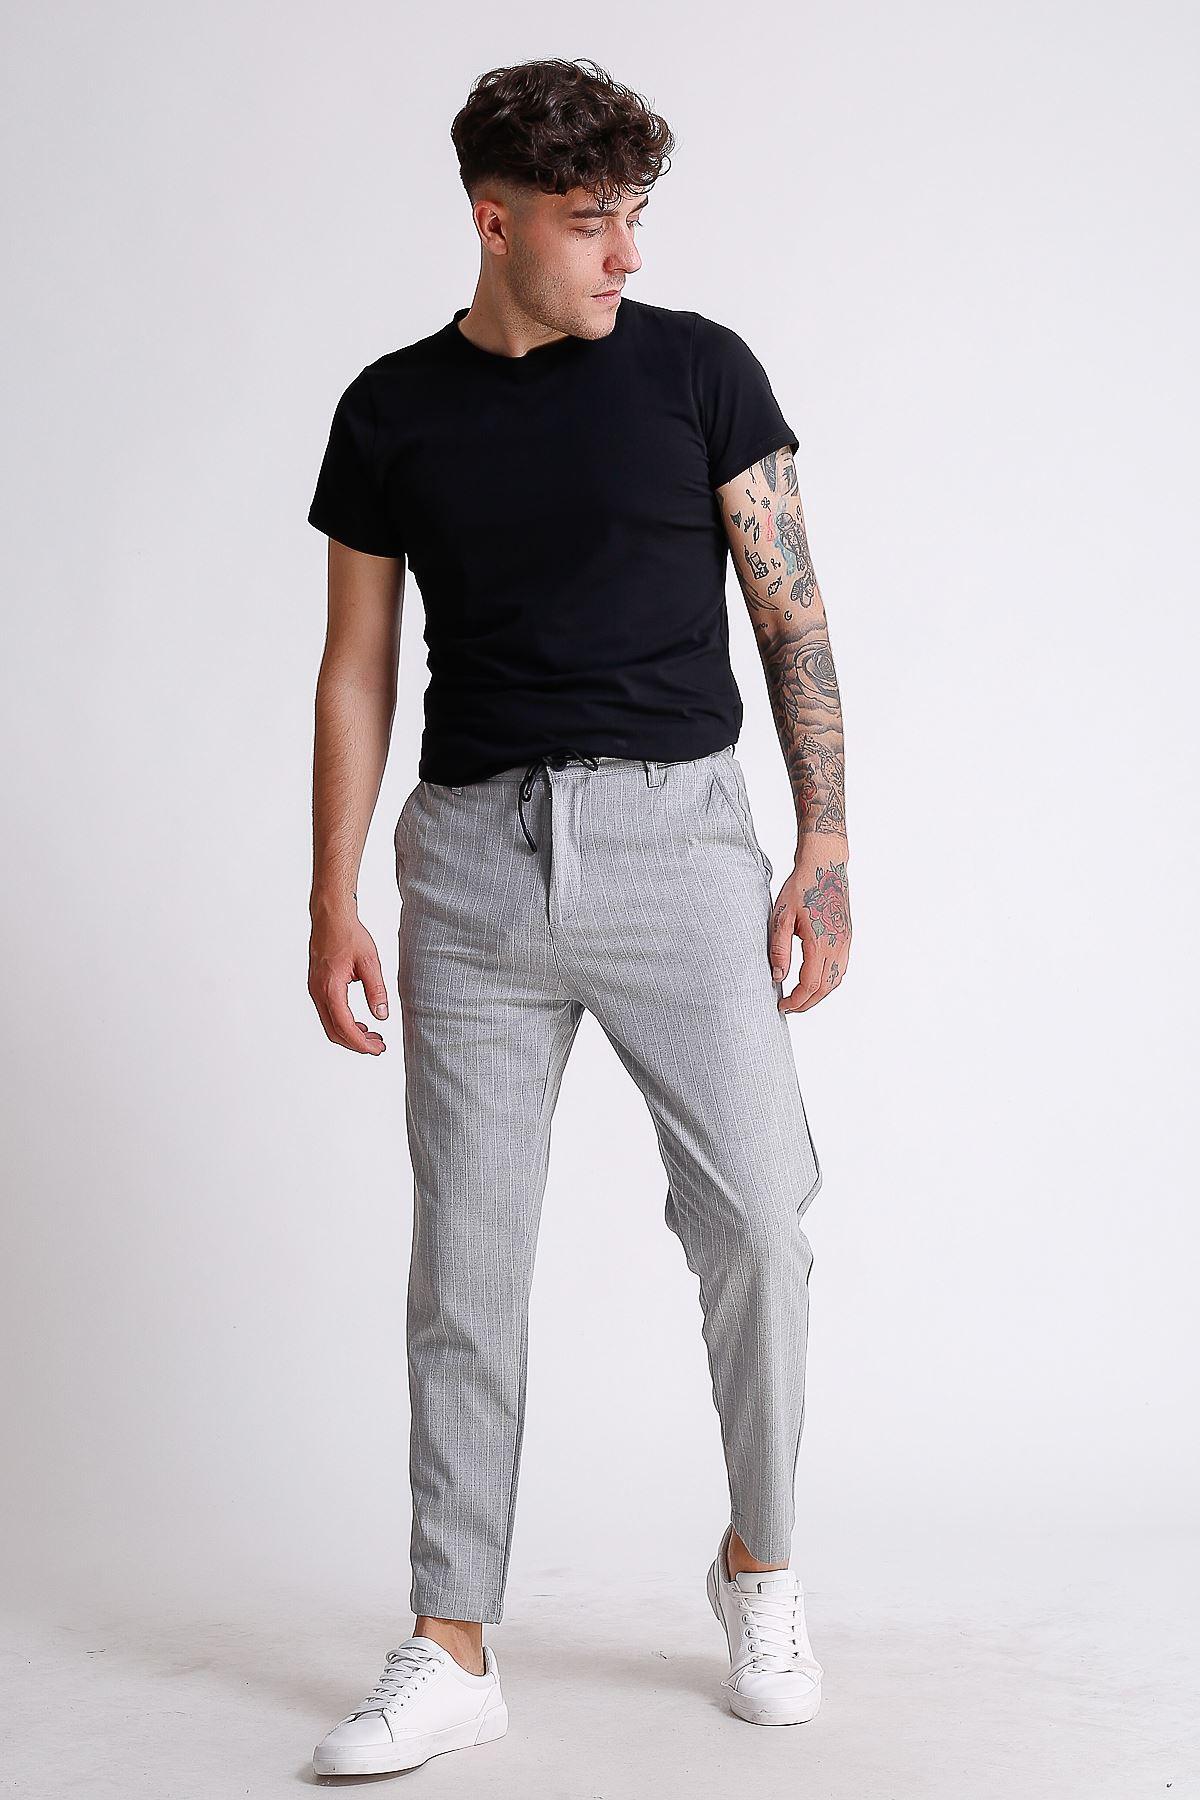 Erkek Beli Lastikli İpli Çizgili Gri Jogger Pantolon